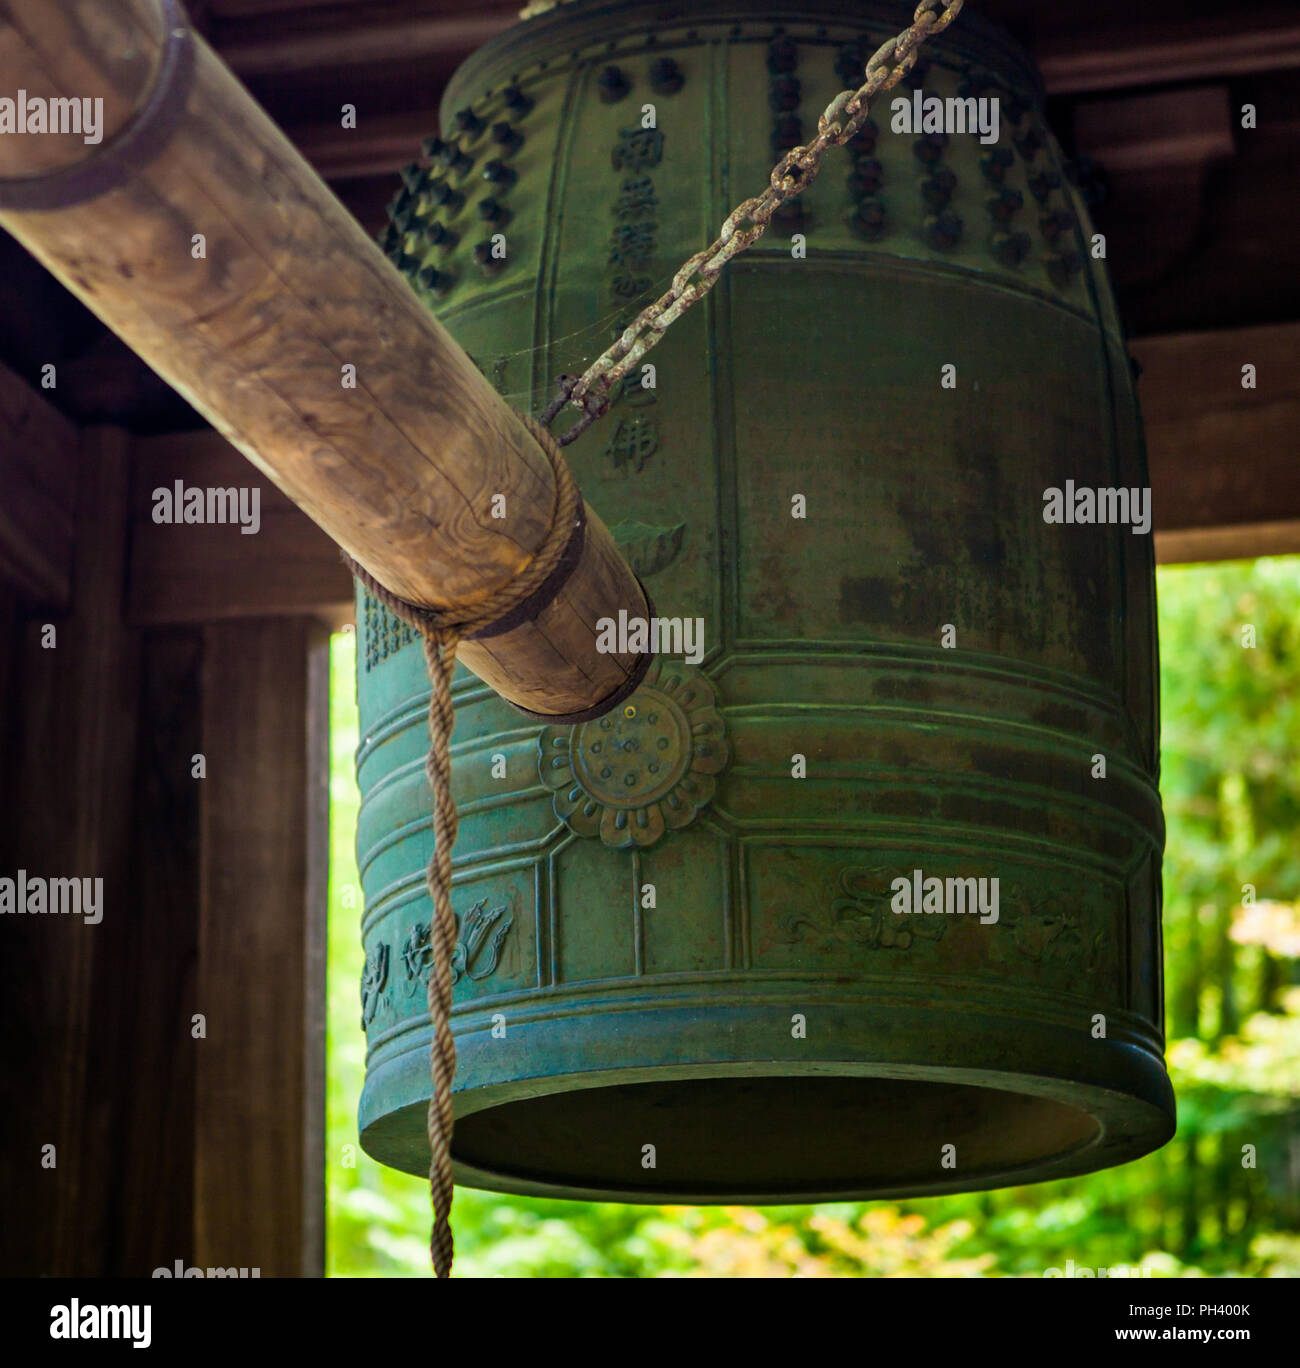 Temple Bell in Hokoku-ji Temple in Kamakura, Japan. - Stock Image